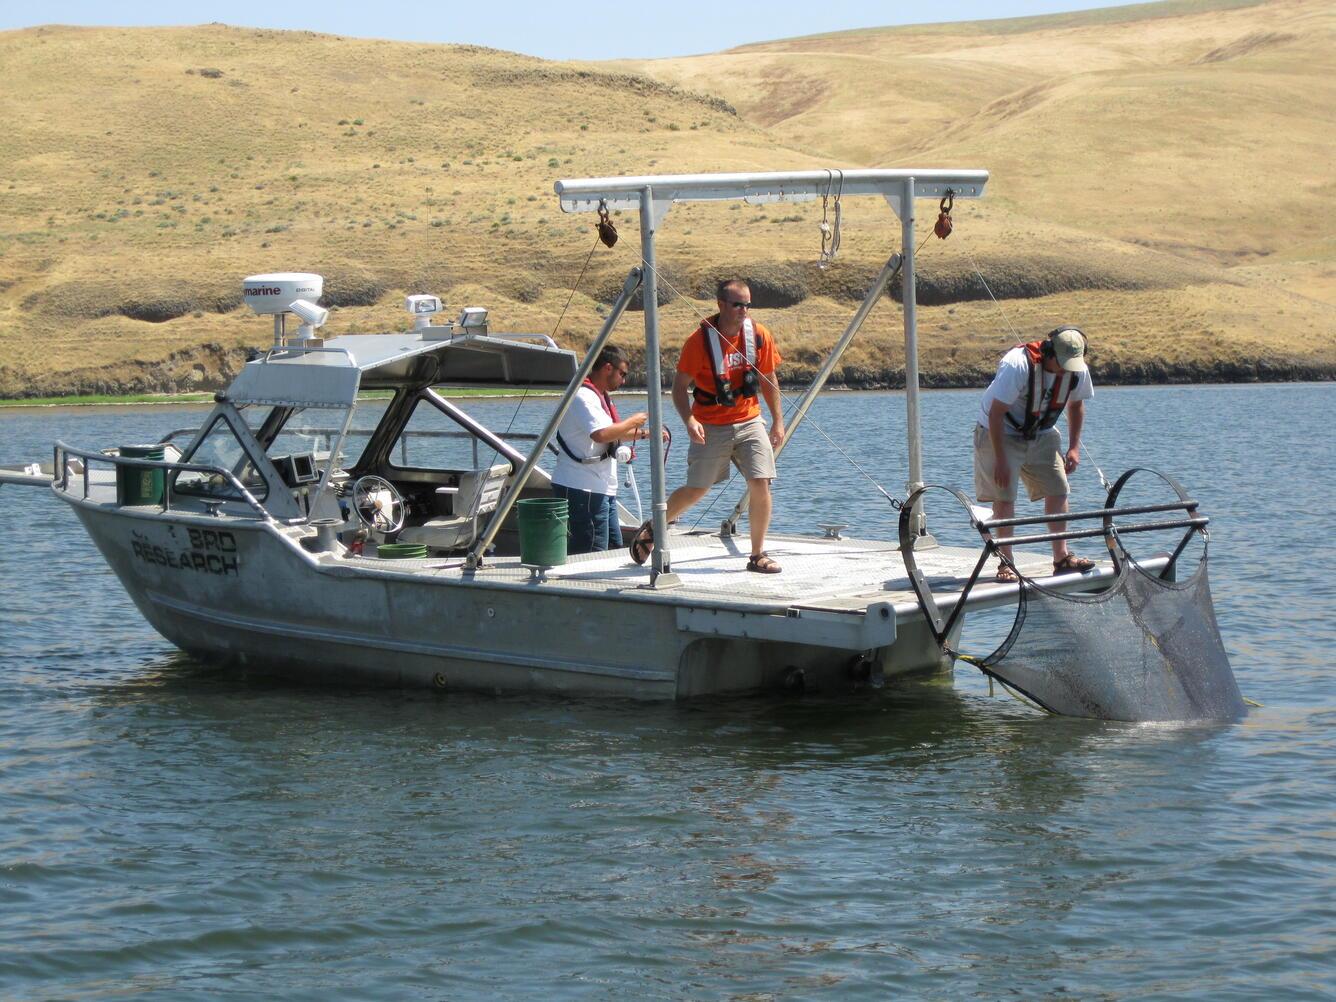 Beam trawling on Lower Granite Reservoir